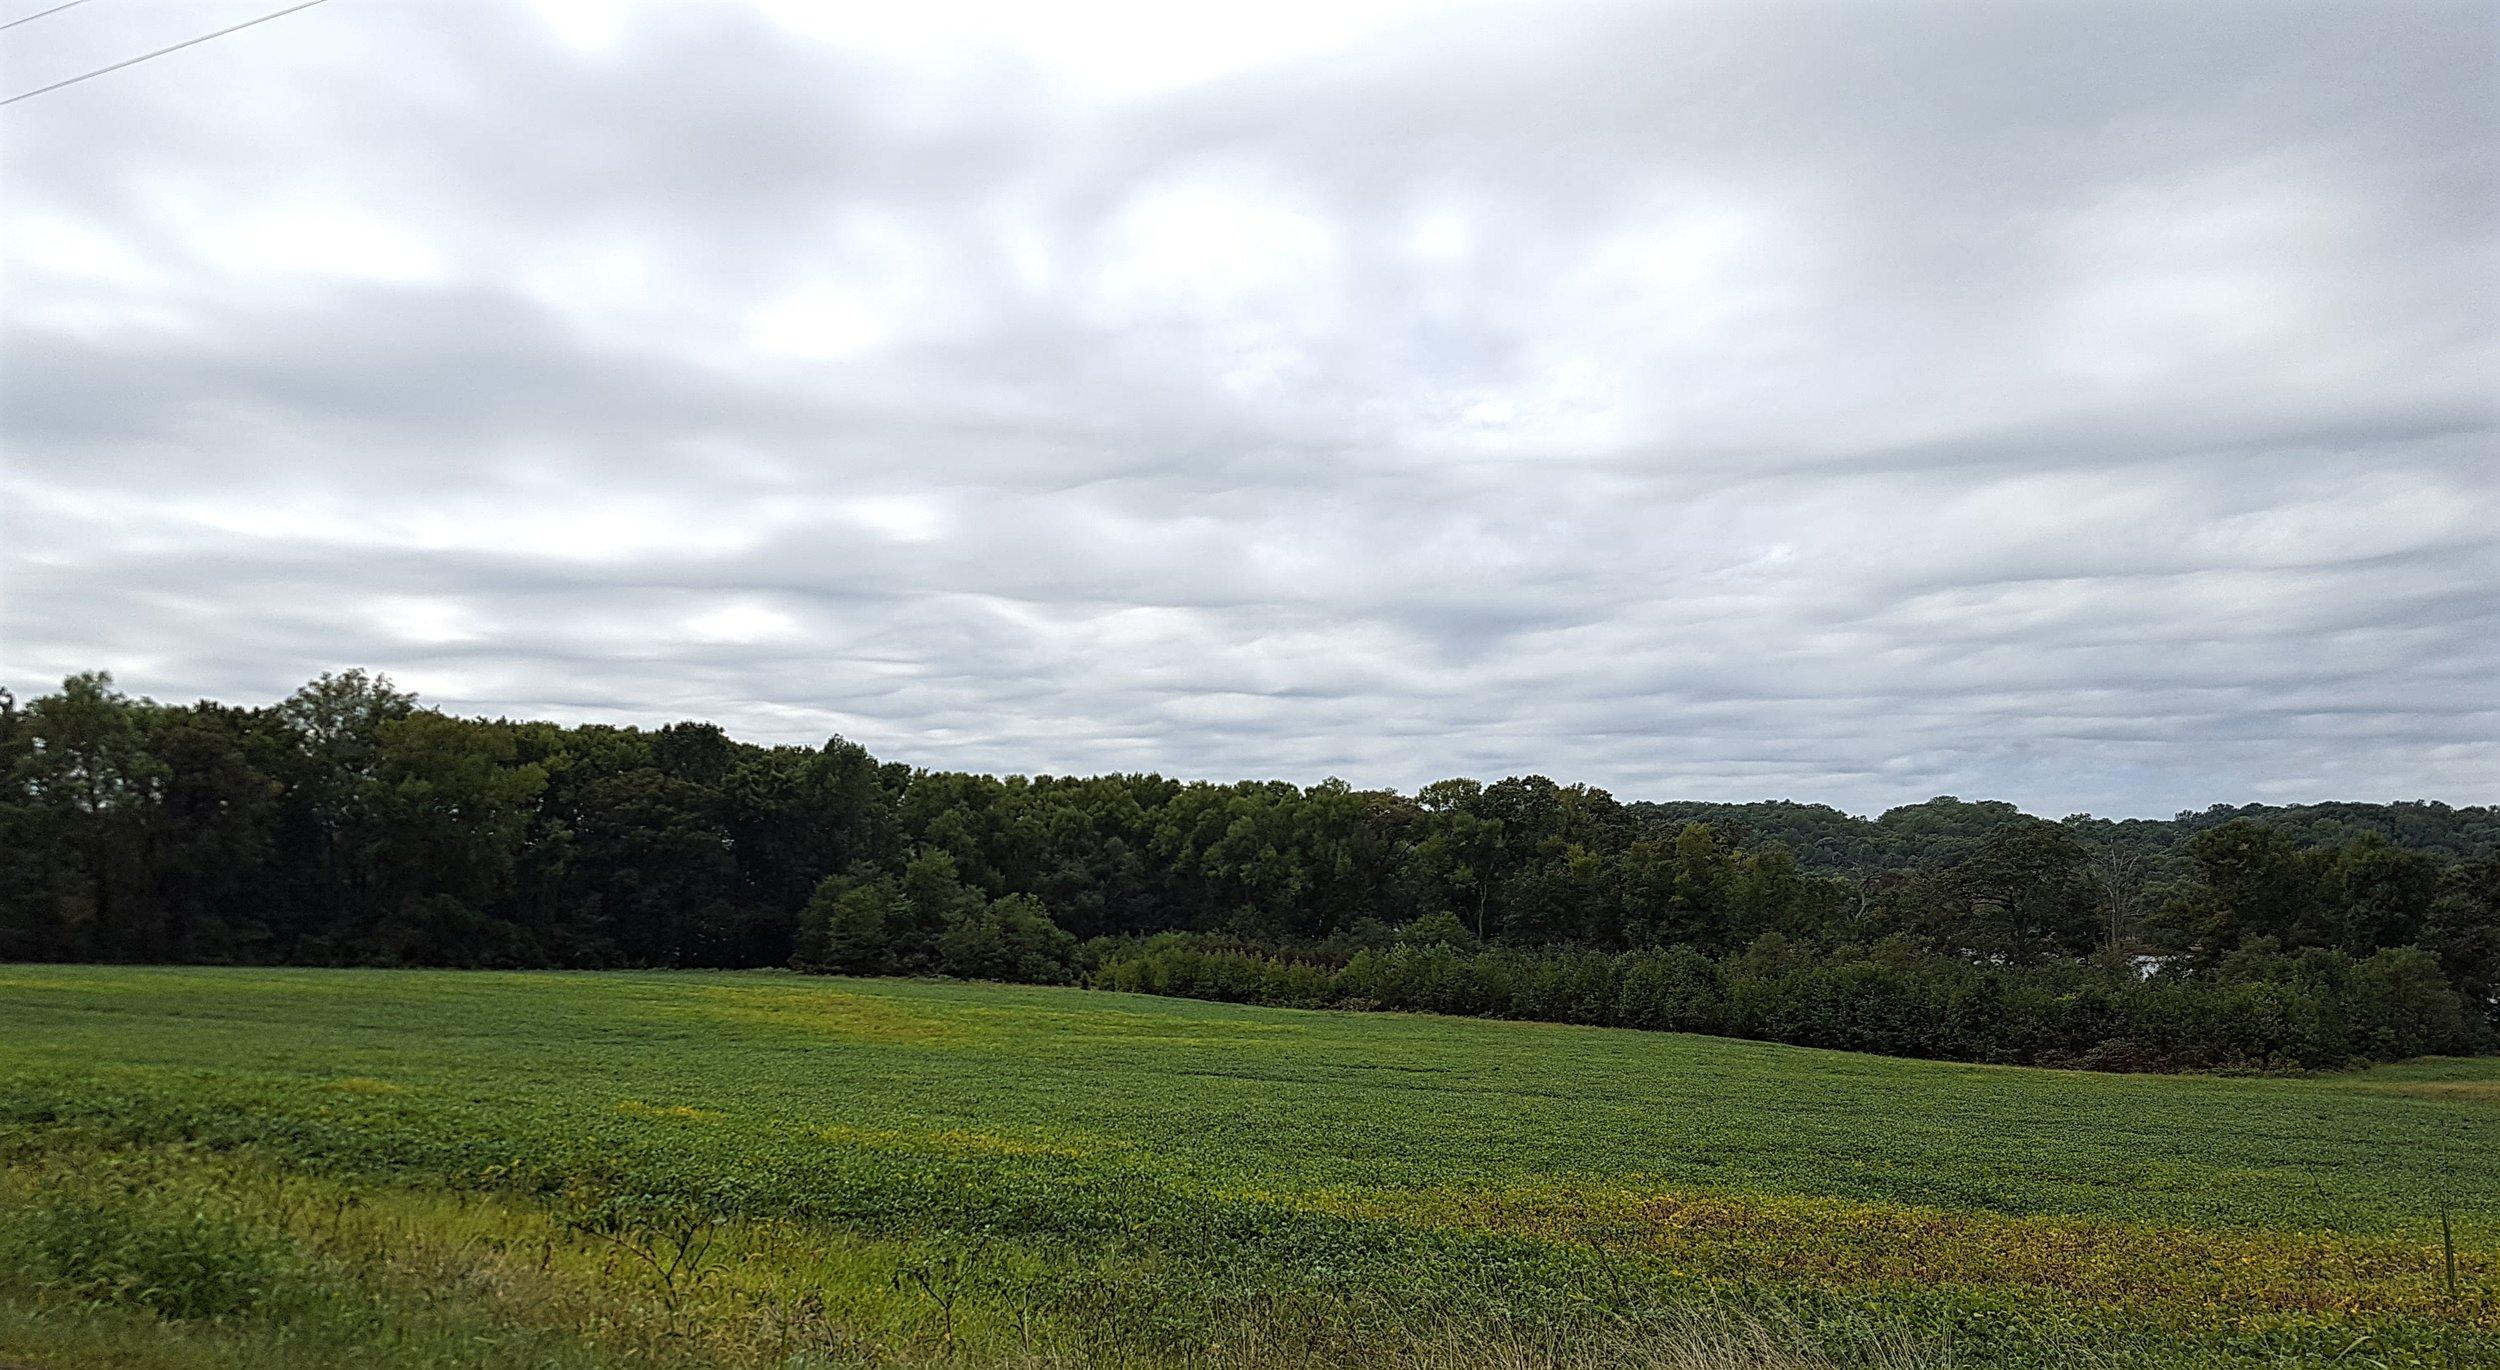 Maryland Countryside